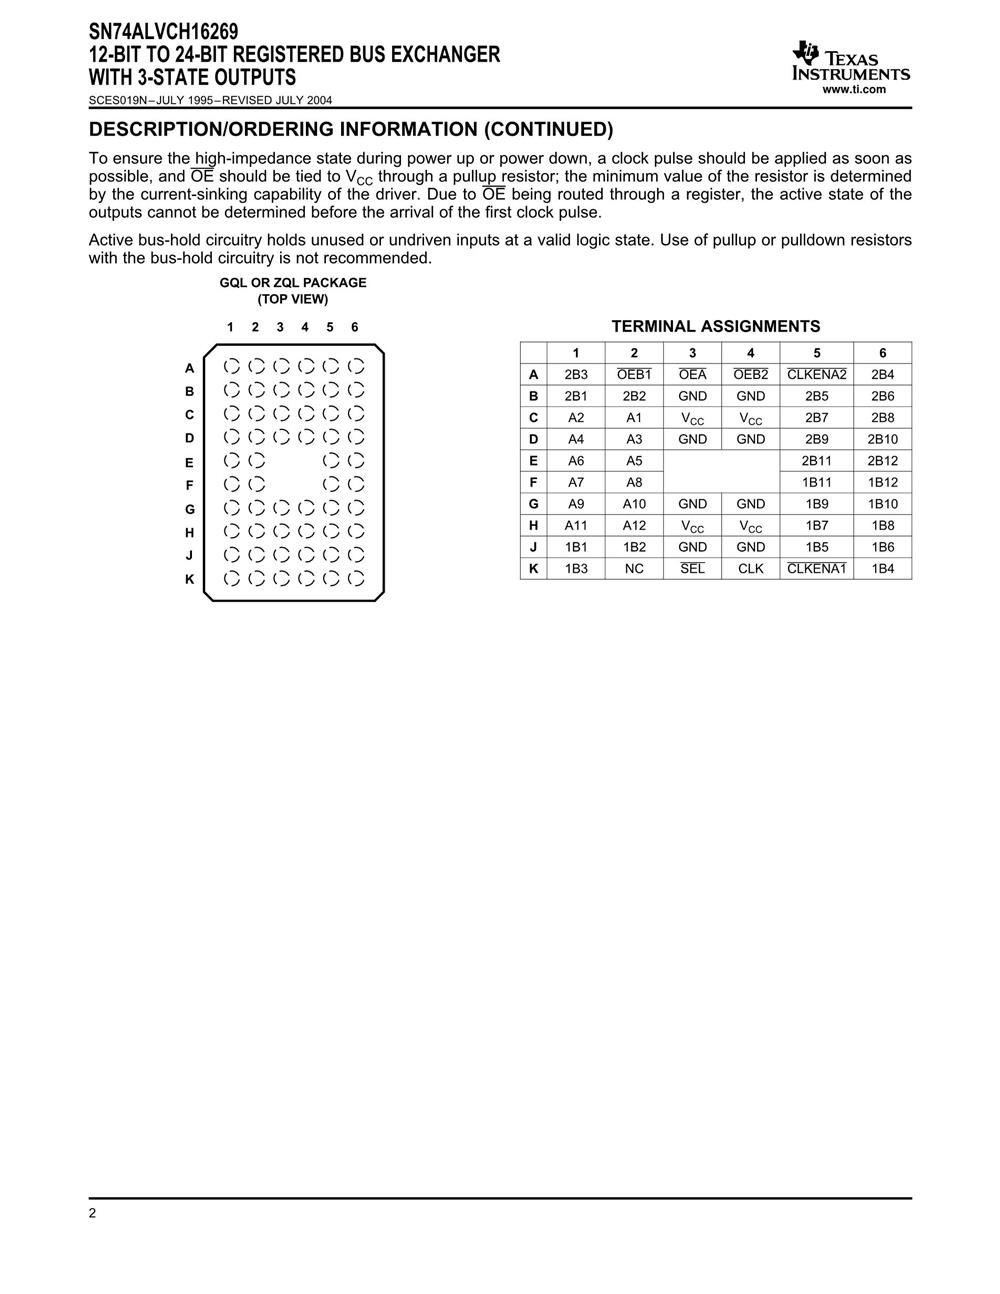 SN74ALVCH16269DGGR's pdf picture 2